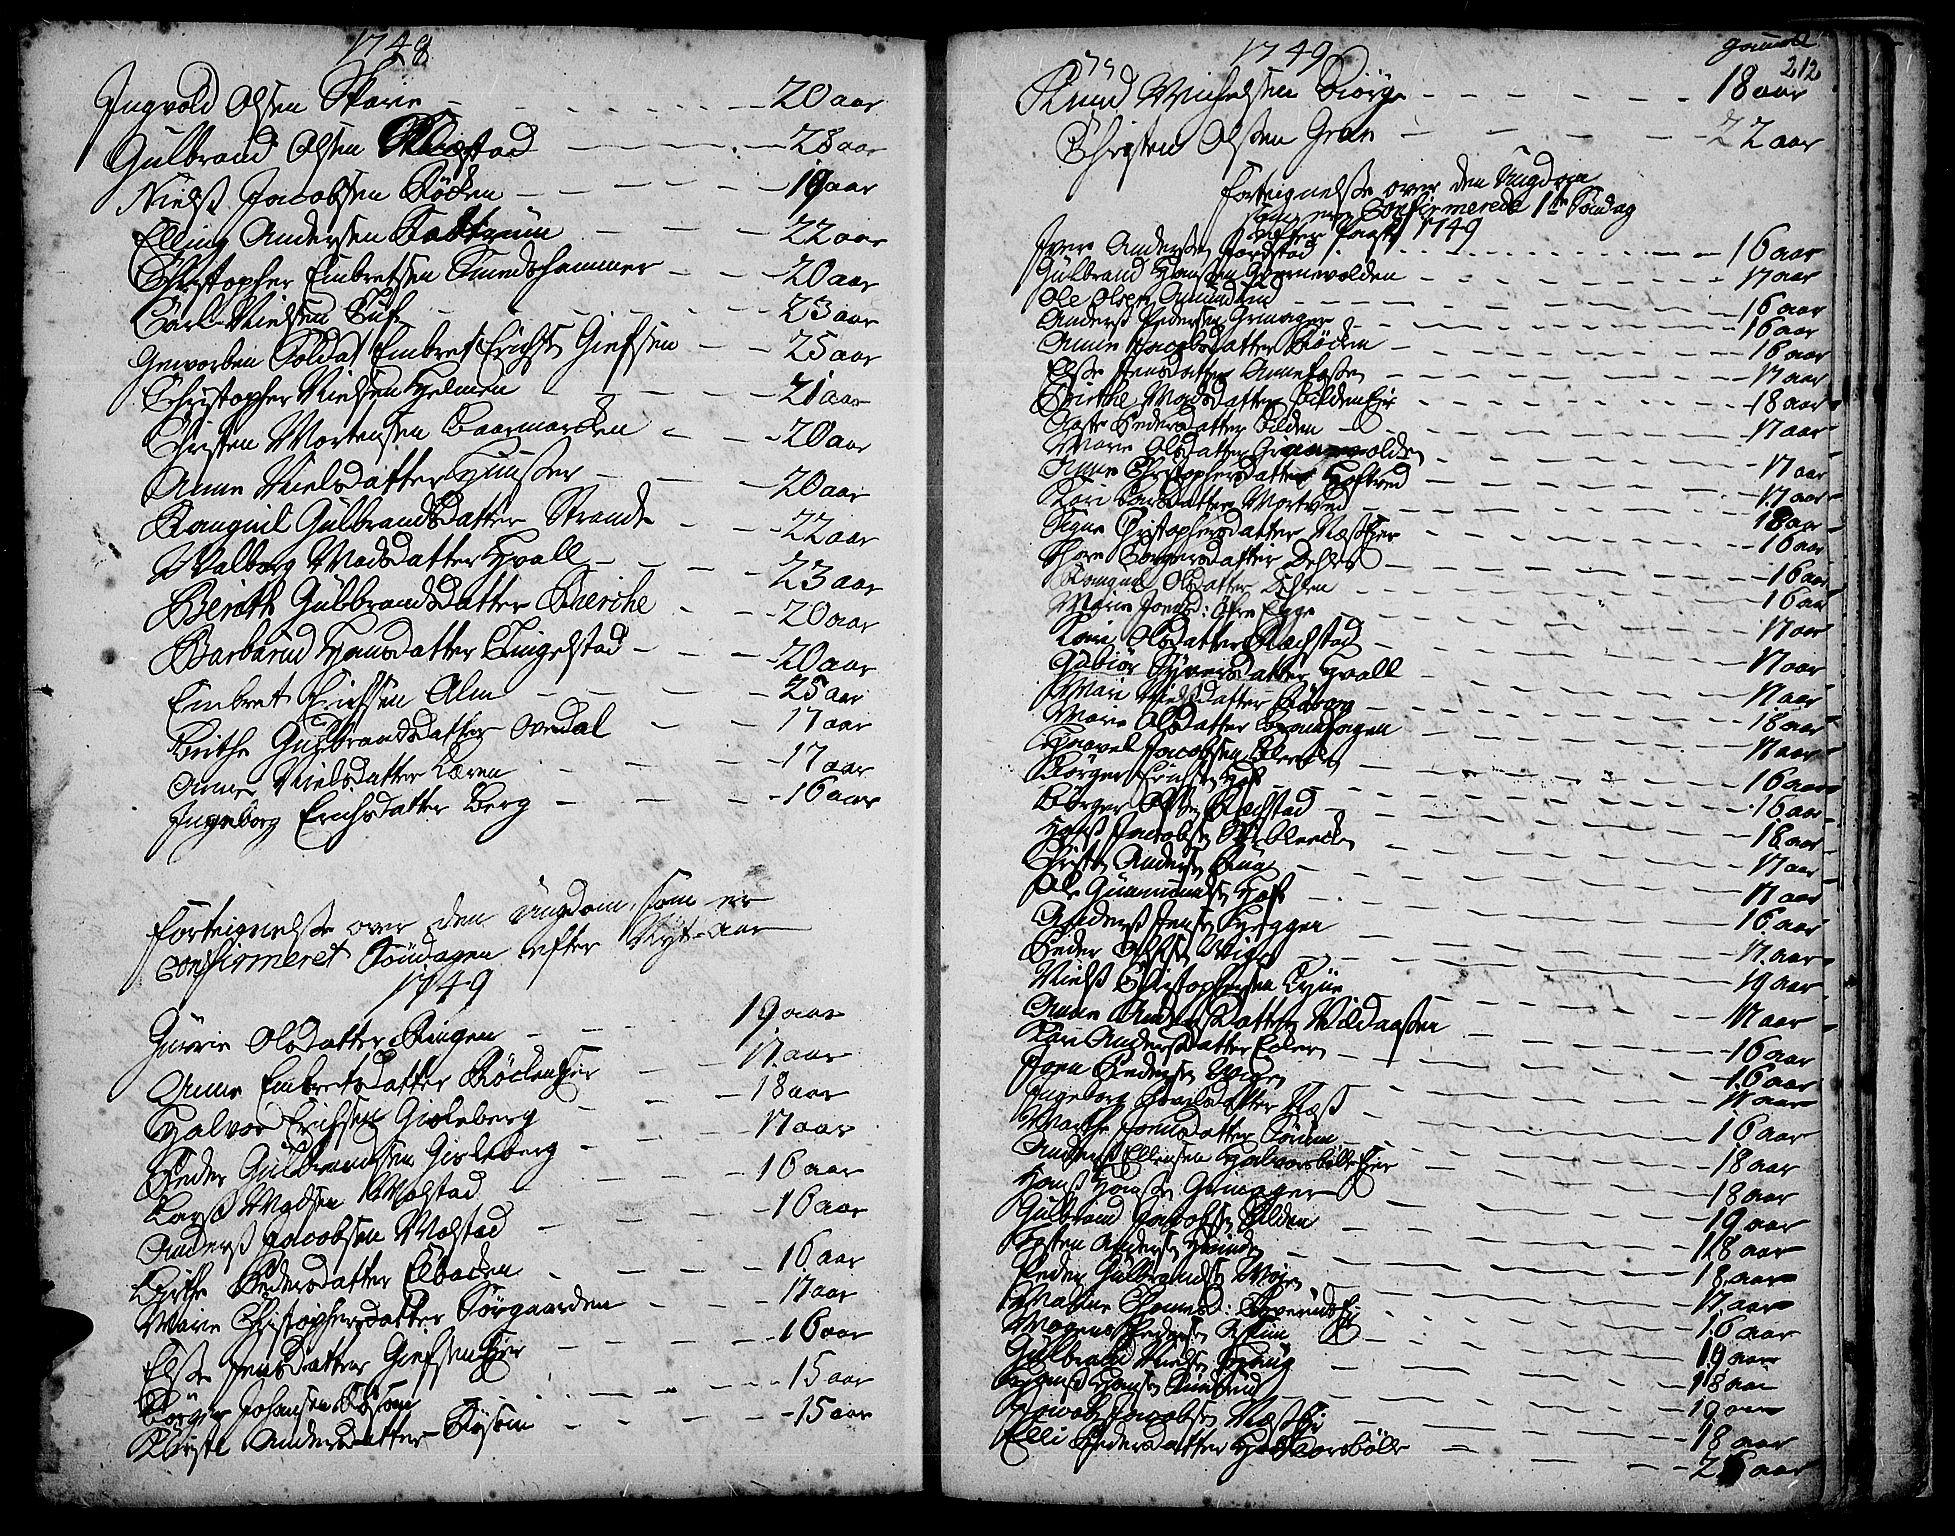 SAH, Gran prestekontor, Ministerialbok nr. 3, 1745-1758, s. 212